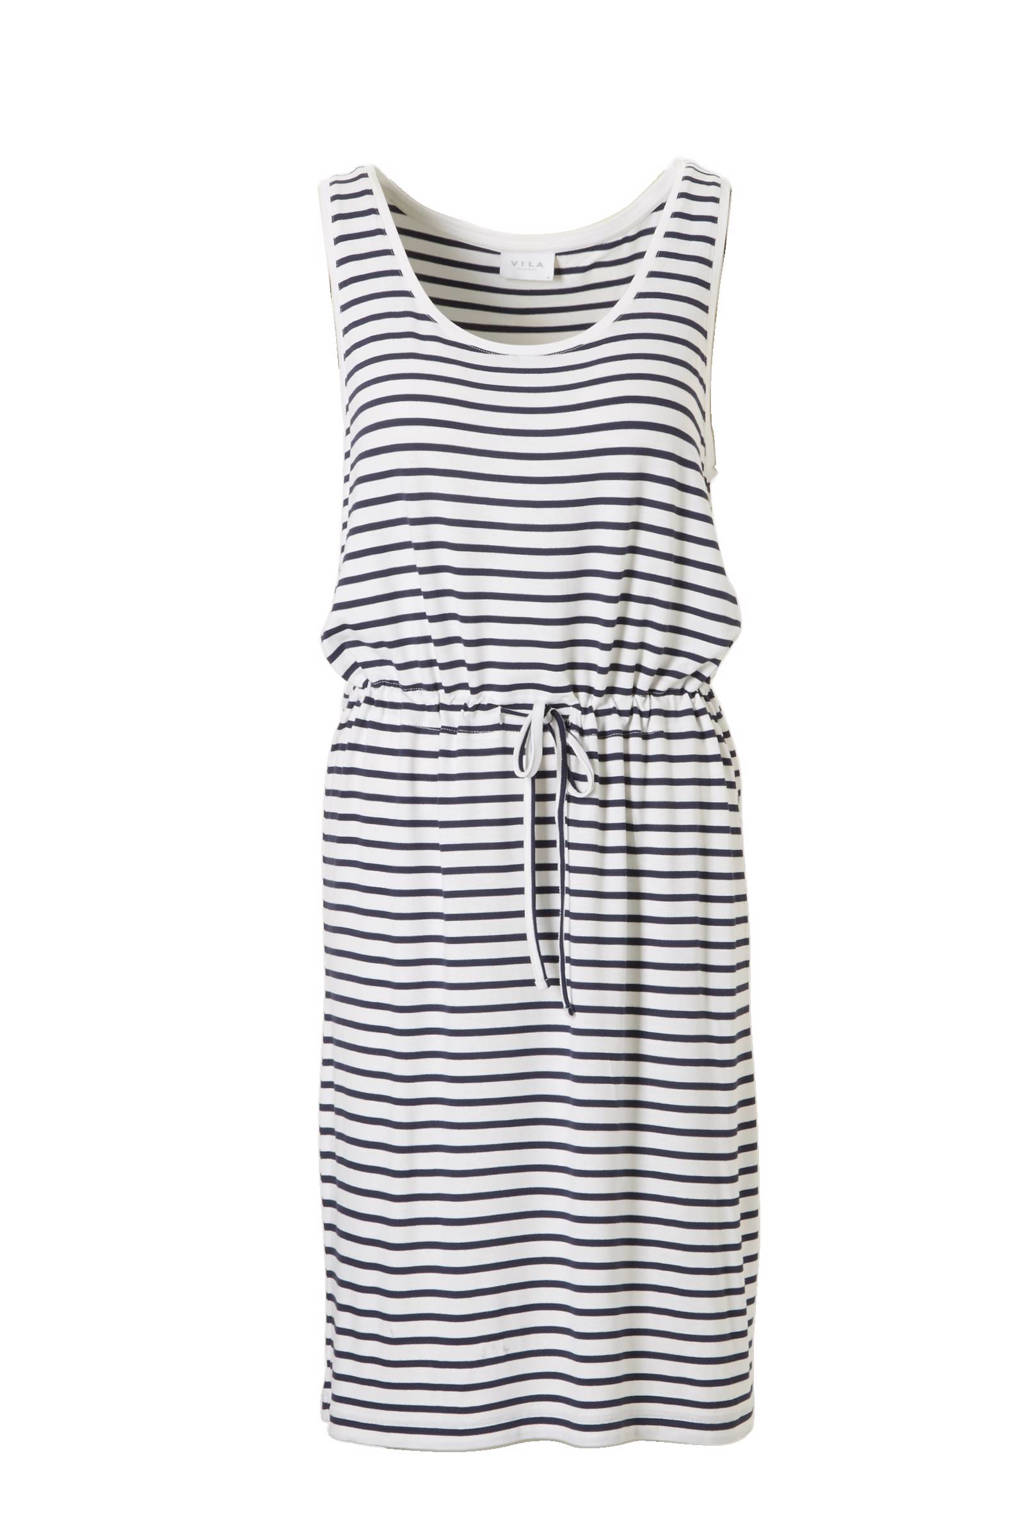 VILA jurk, Donkerblauw/ecru